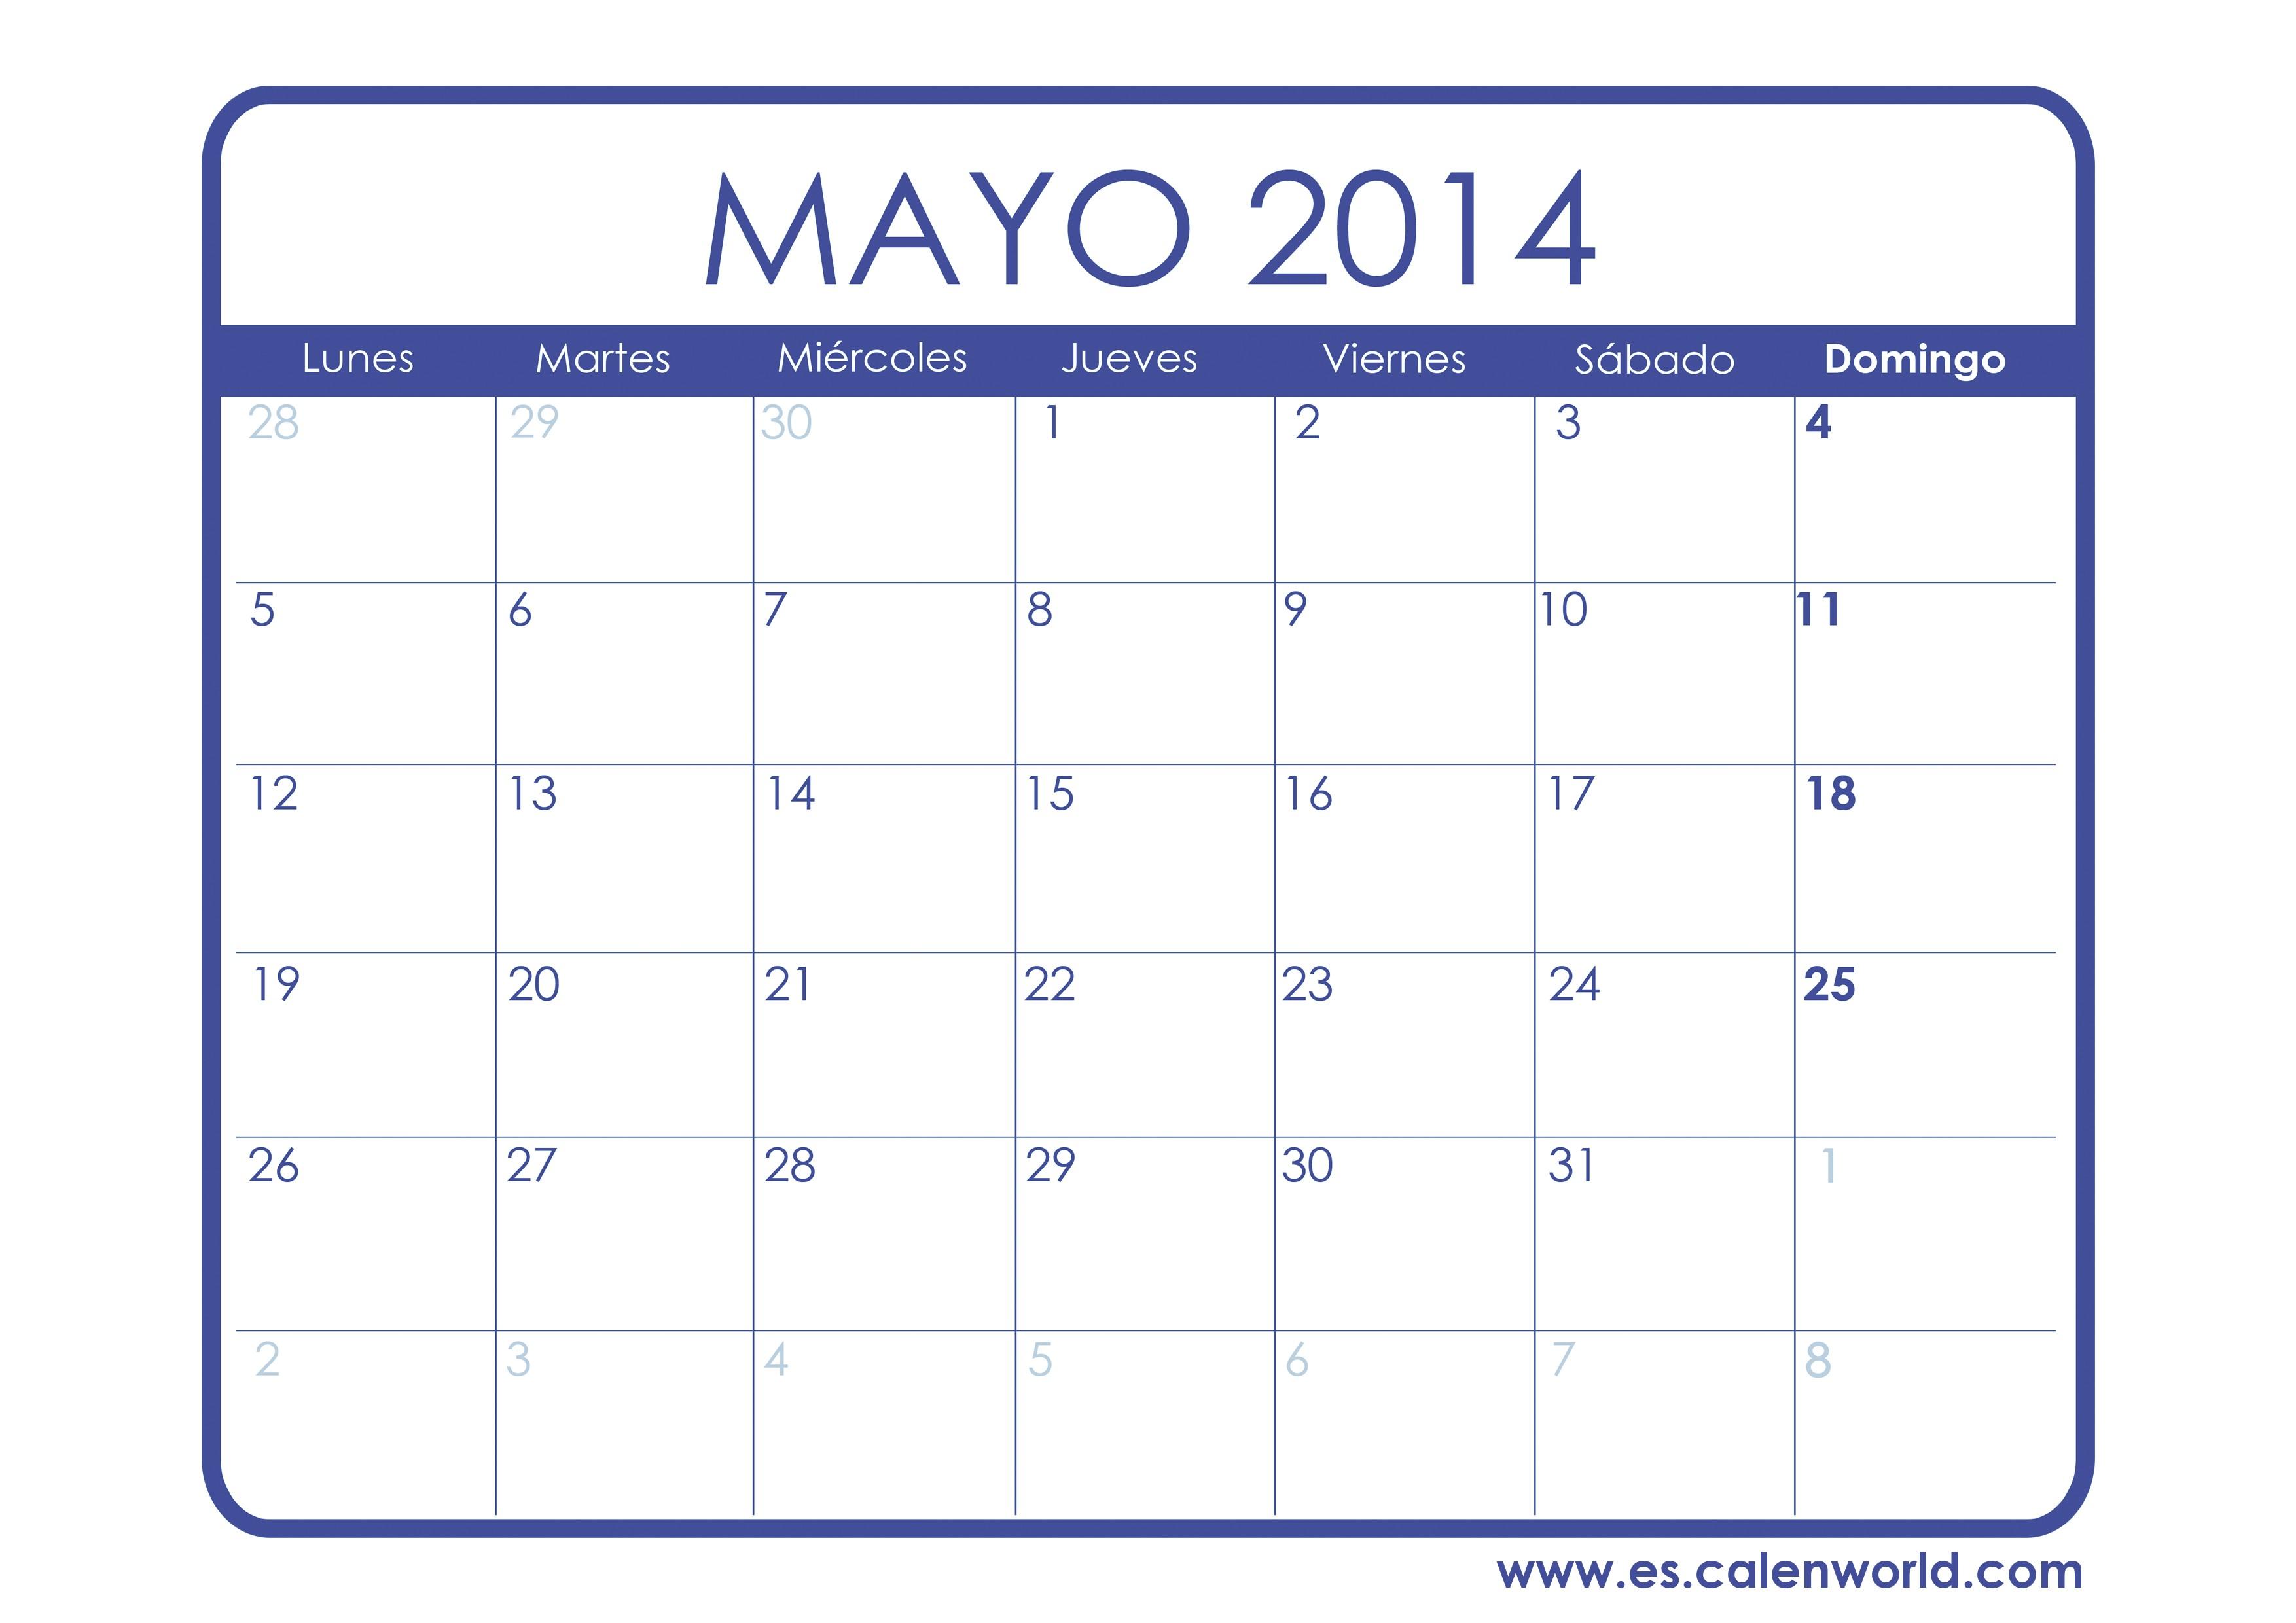 Calendario 2016 En Chile Para Imprimir Mejores Y Más Novedosos Imprimir Calendario Mes A Mes Calendario Mensual Diciembre Para Of Calendario 2016 En Chile Para Imprimir Más Arriba-a-fecha Blank Year Calendar Blank Calendar Pinterest